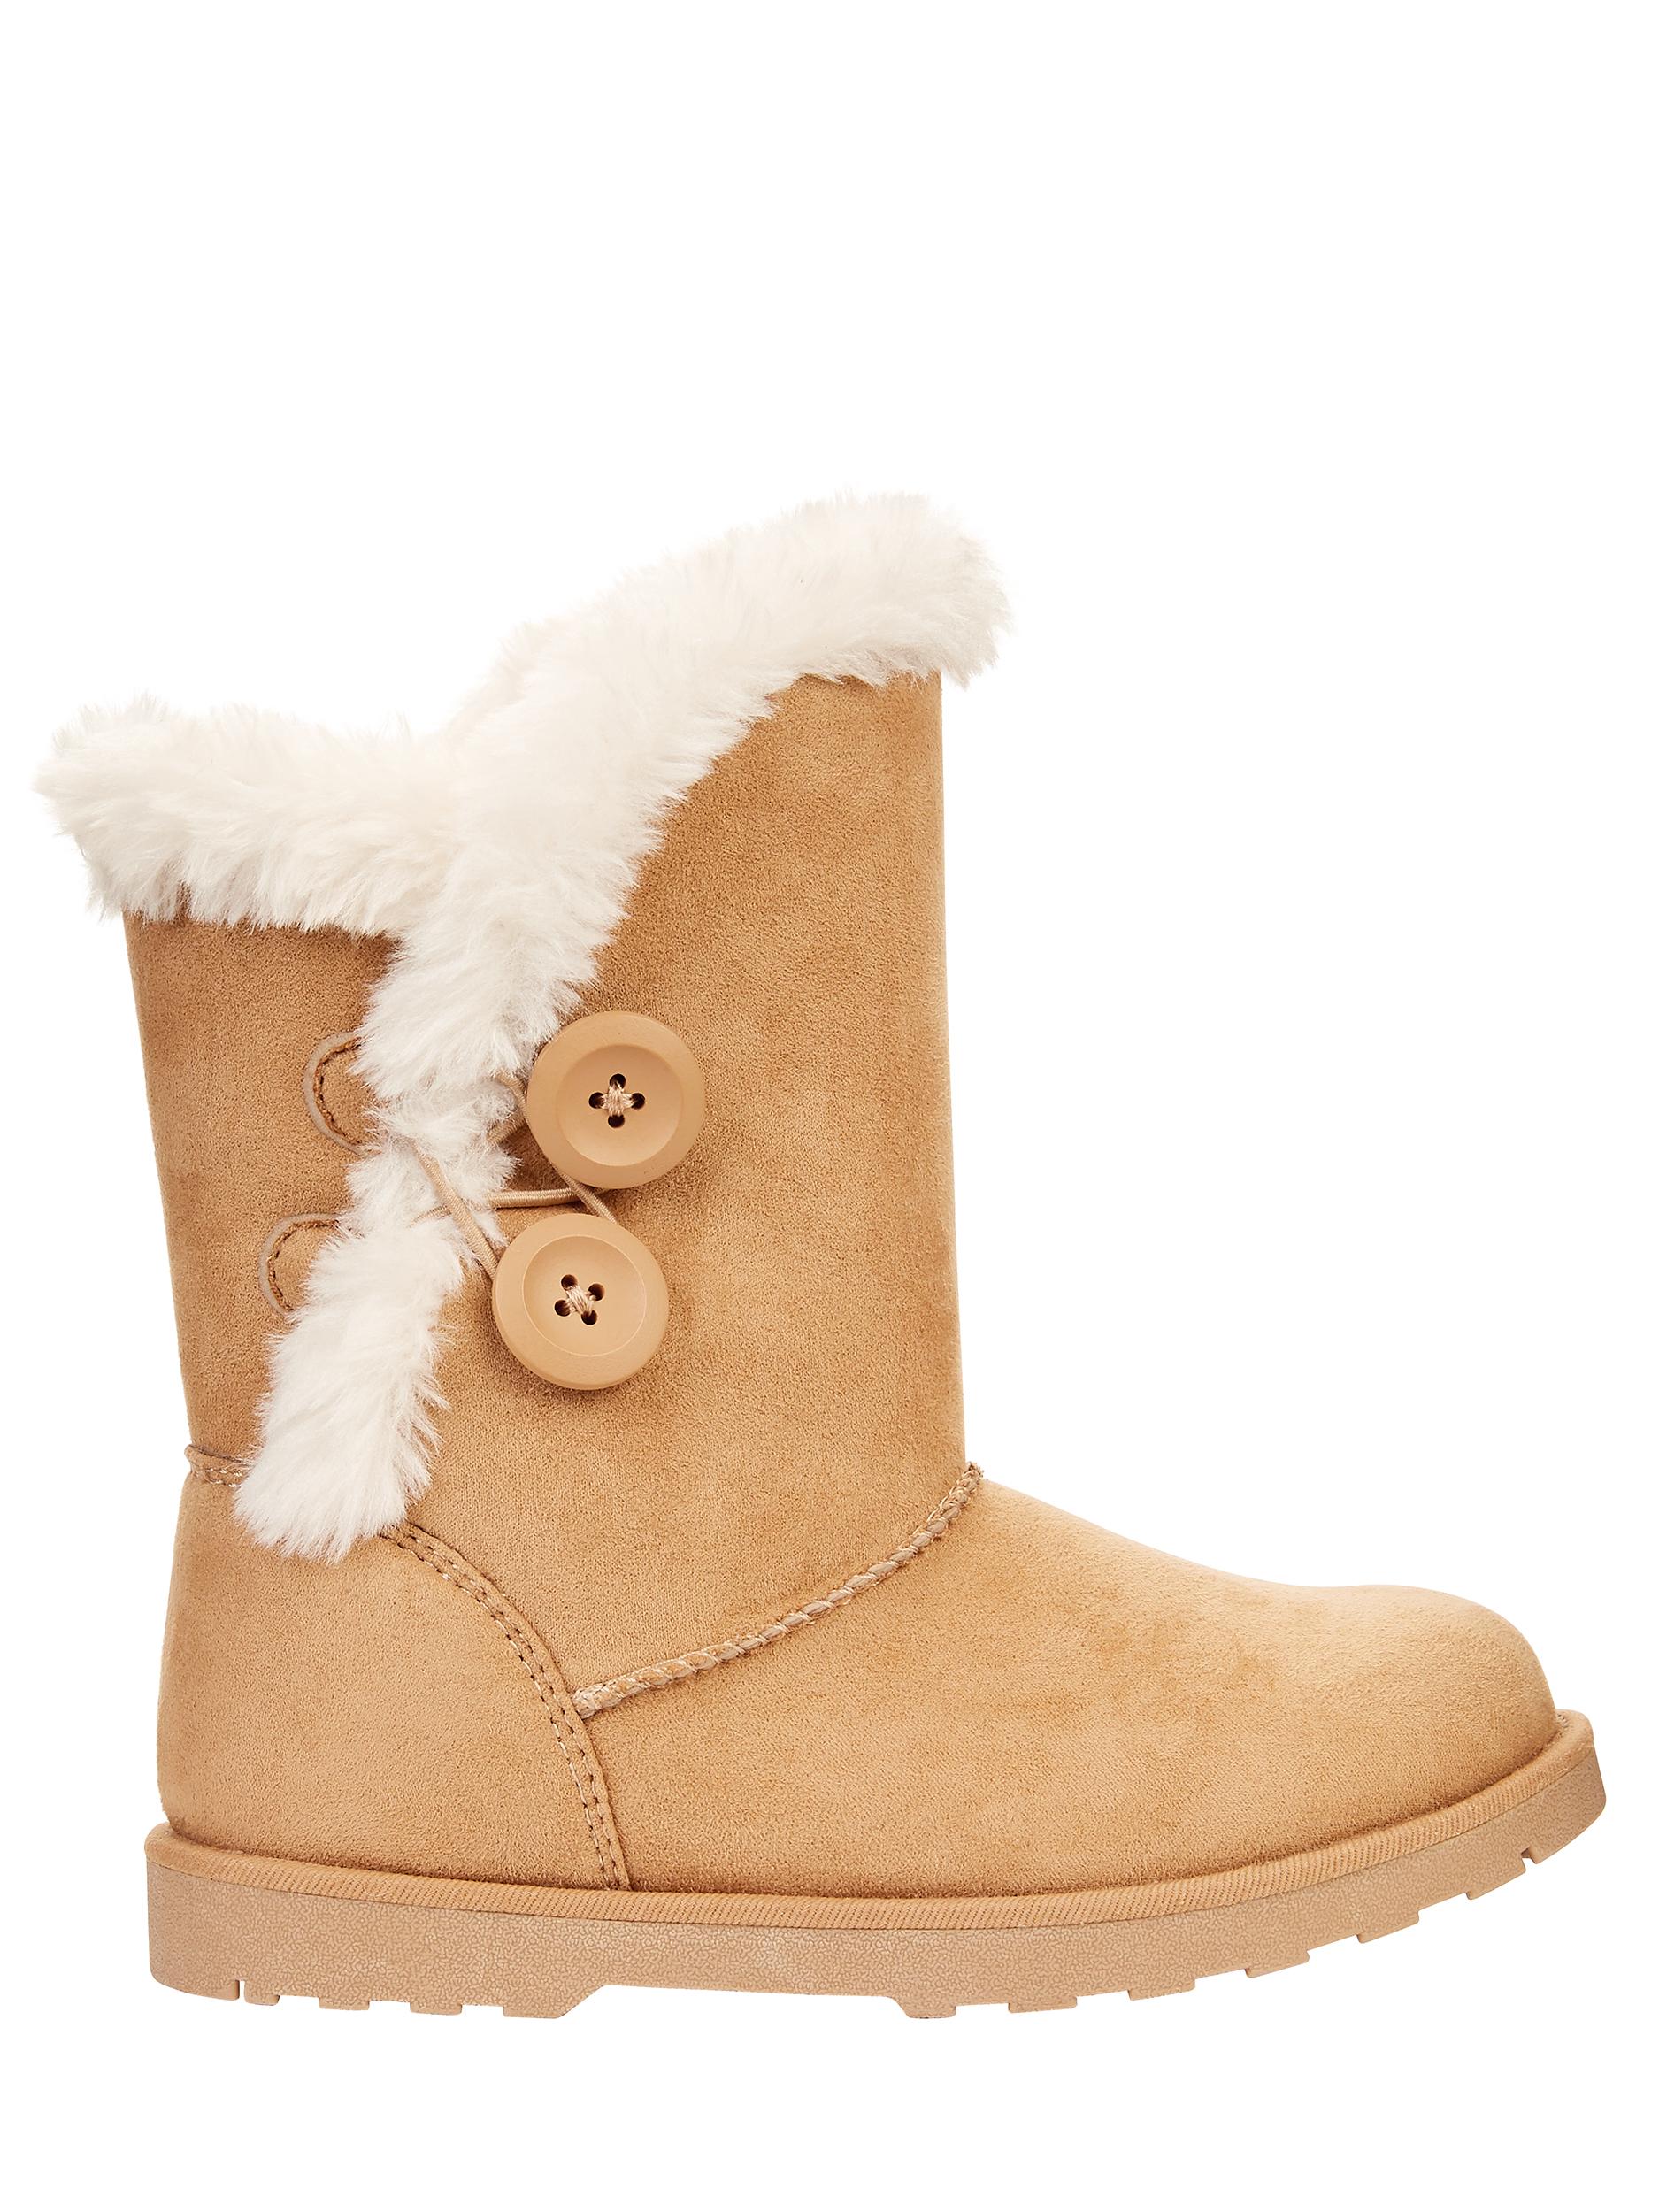 CALISTOGA - Calistoga Vegan Suede Faux Fur Mid Calf Boots (Little Girls/Big Girls)  $5 + FS with $35